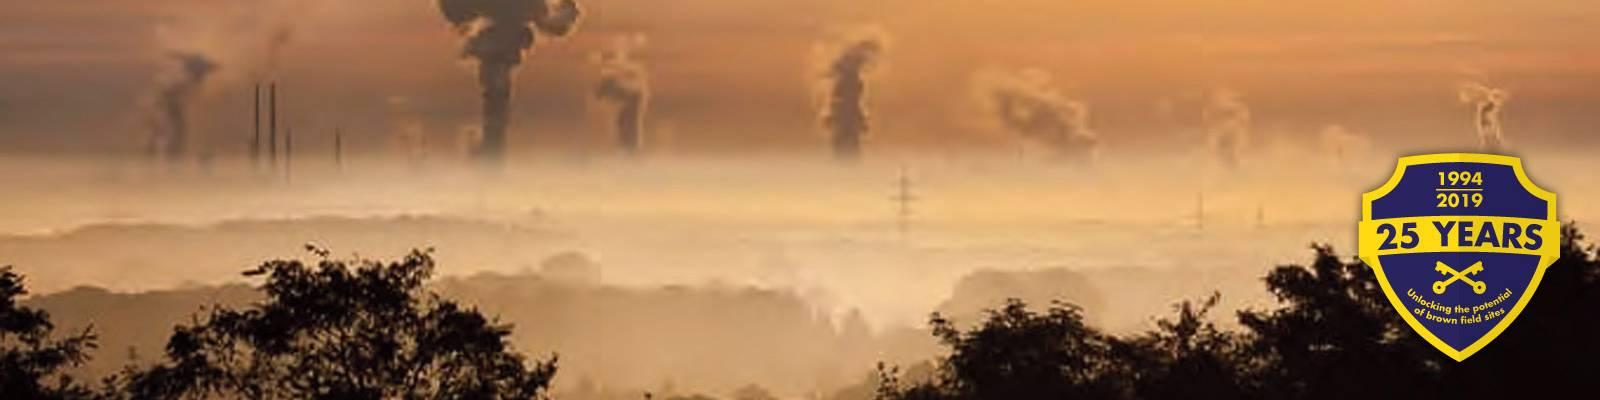 industry-sunrise-clouds-fog-pollution.jpg